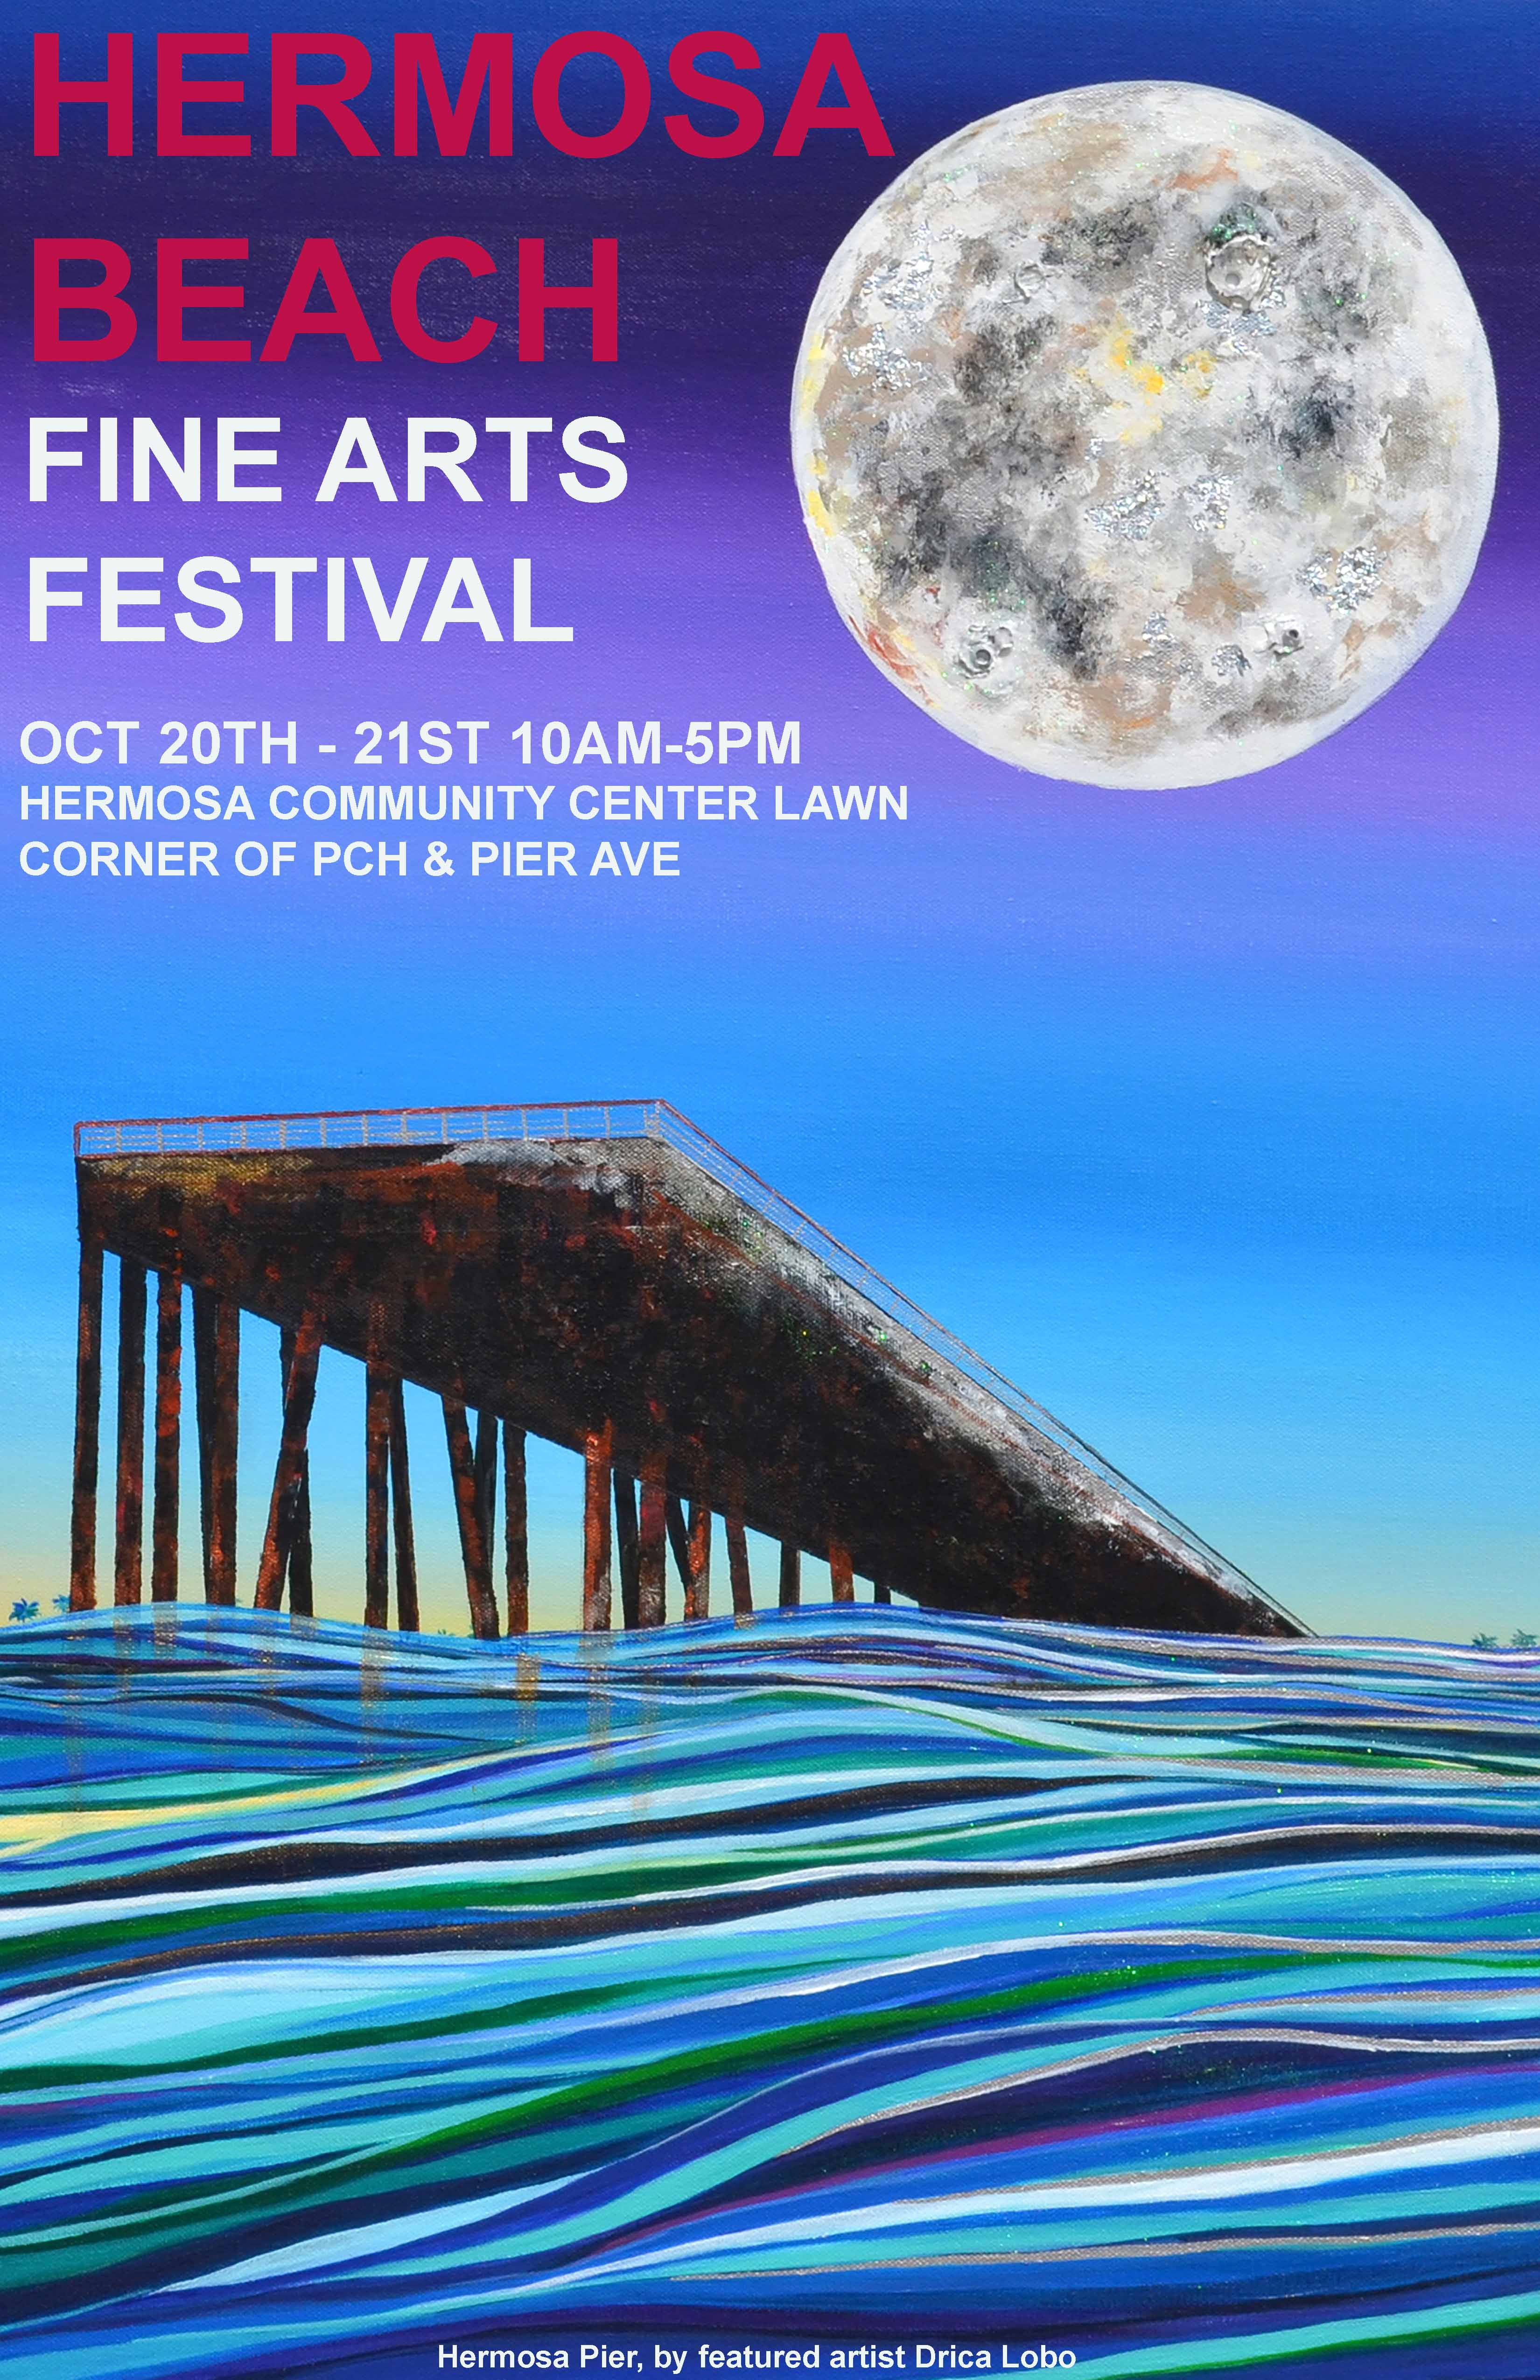 Hermosa Beach Fine Arts Festival @ Hermosa Community Center Lawn | Hermosa Beach | California | United States